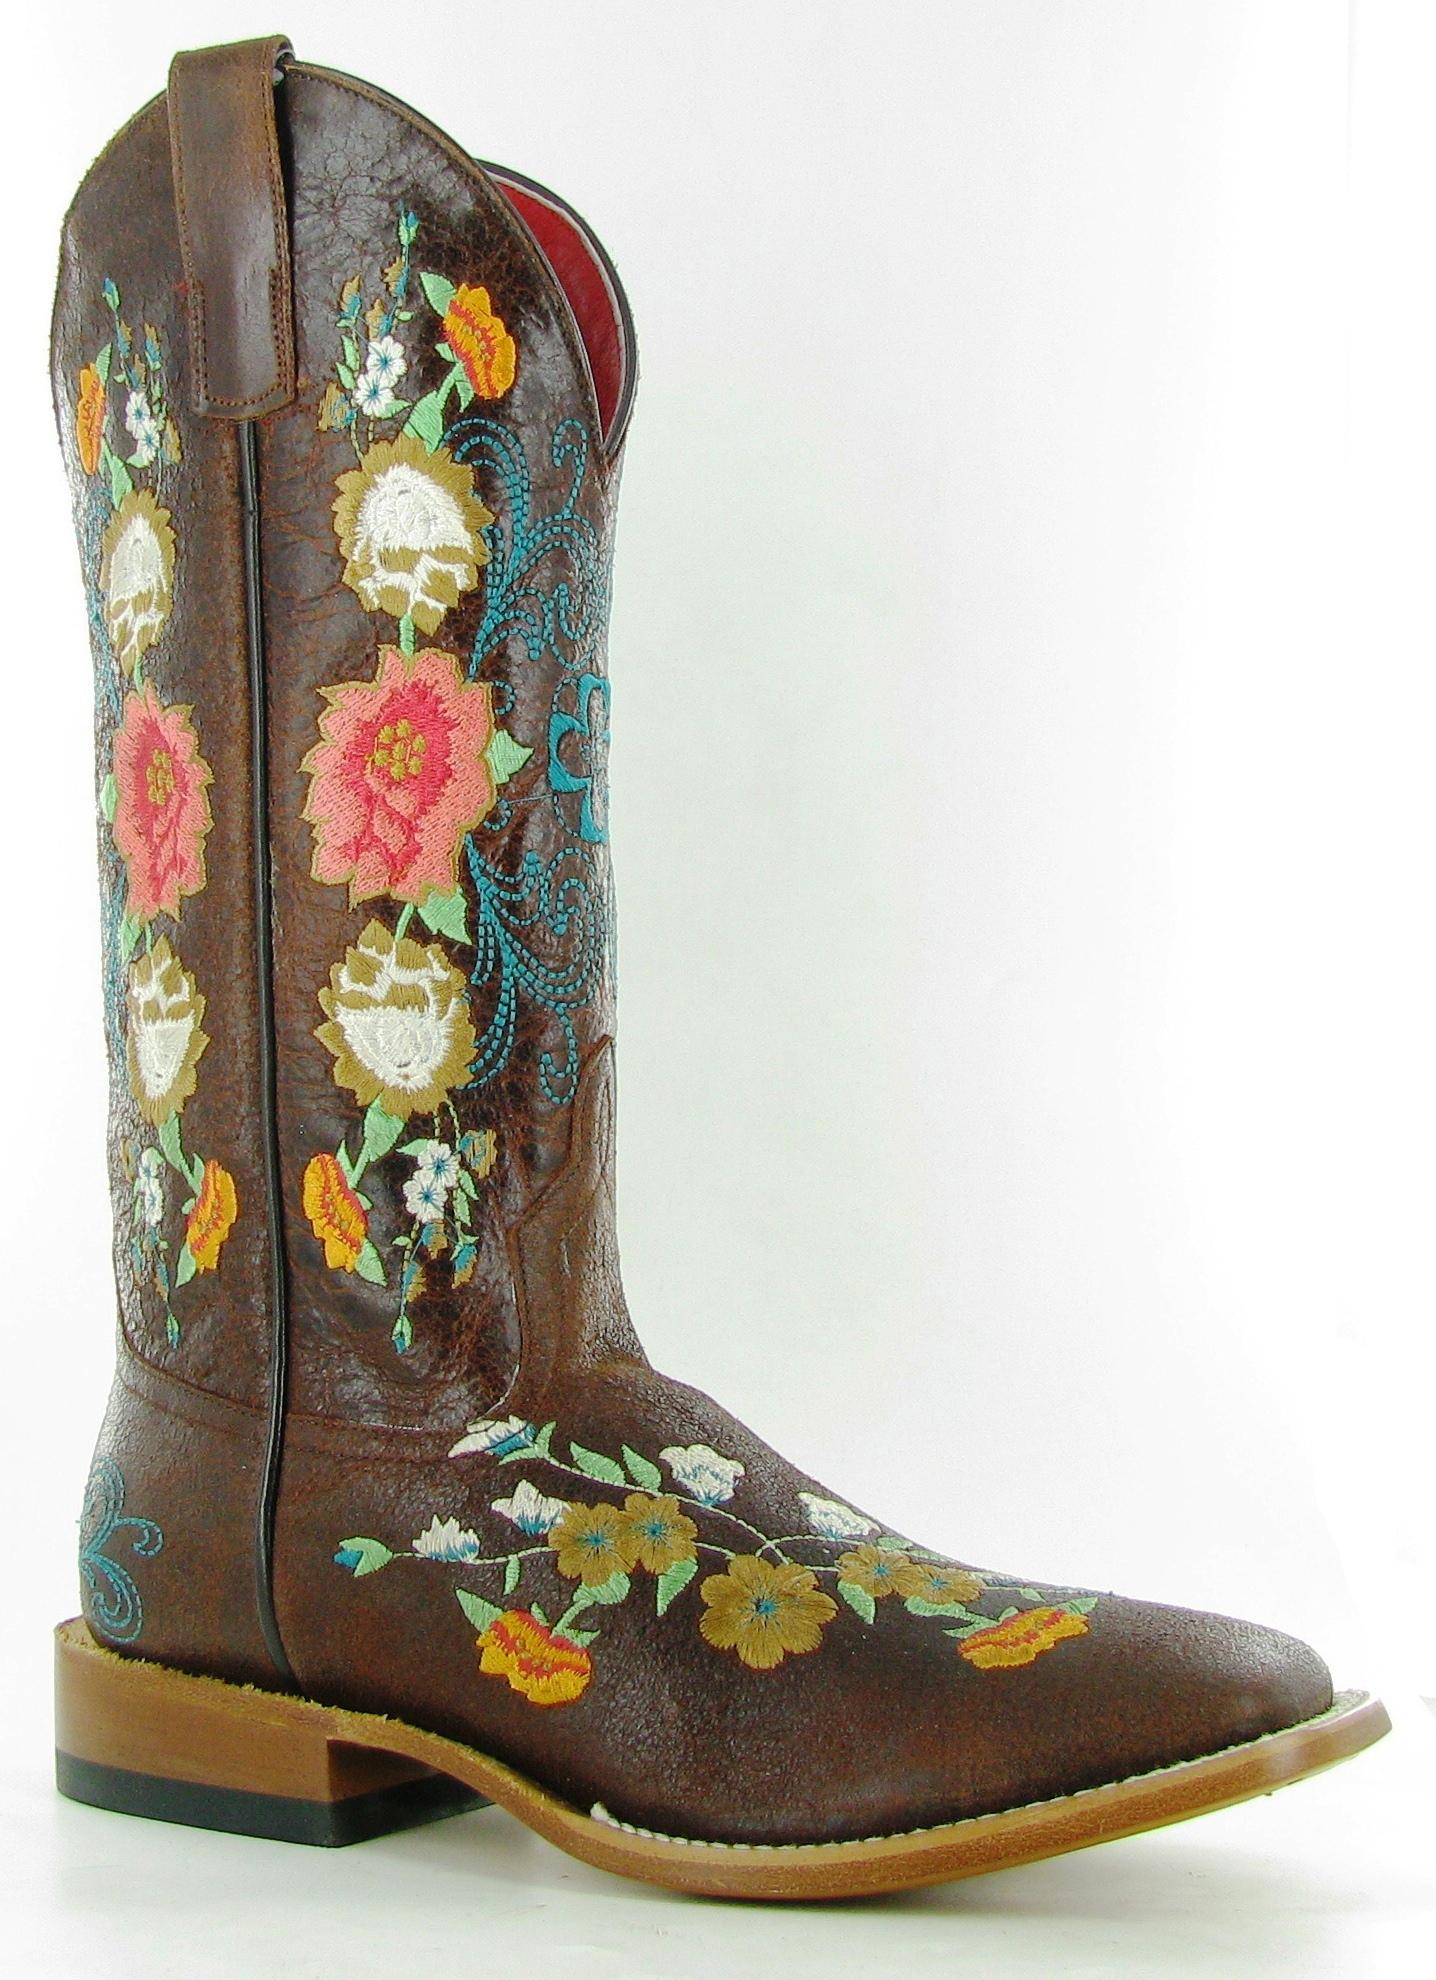 Macie Bean Square Toe Cowboy Boot Giveaway